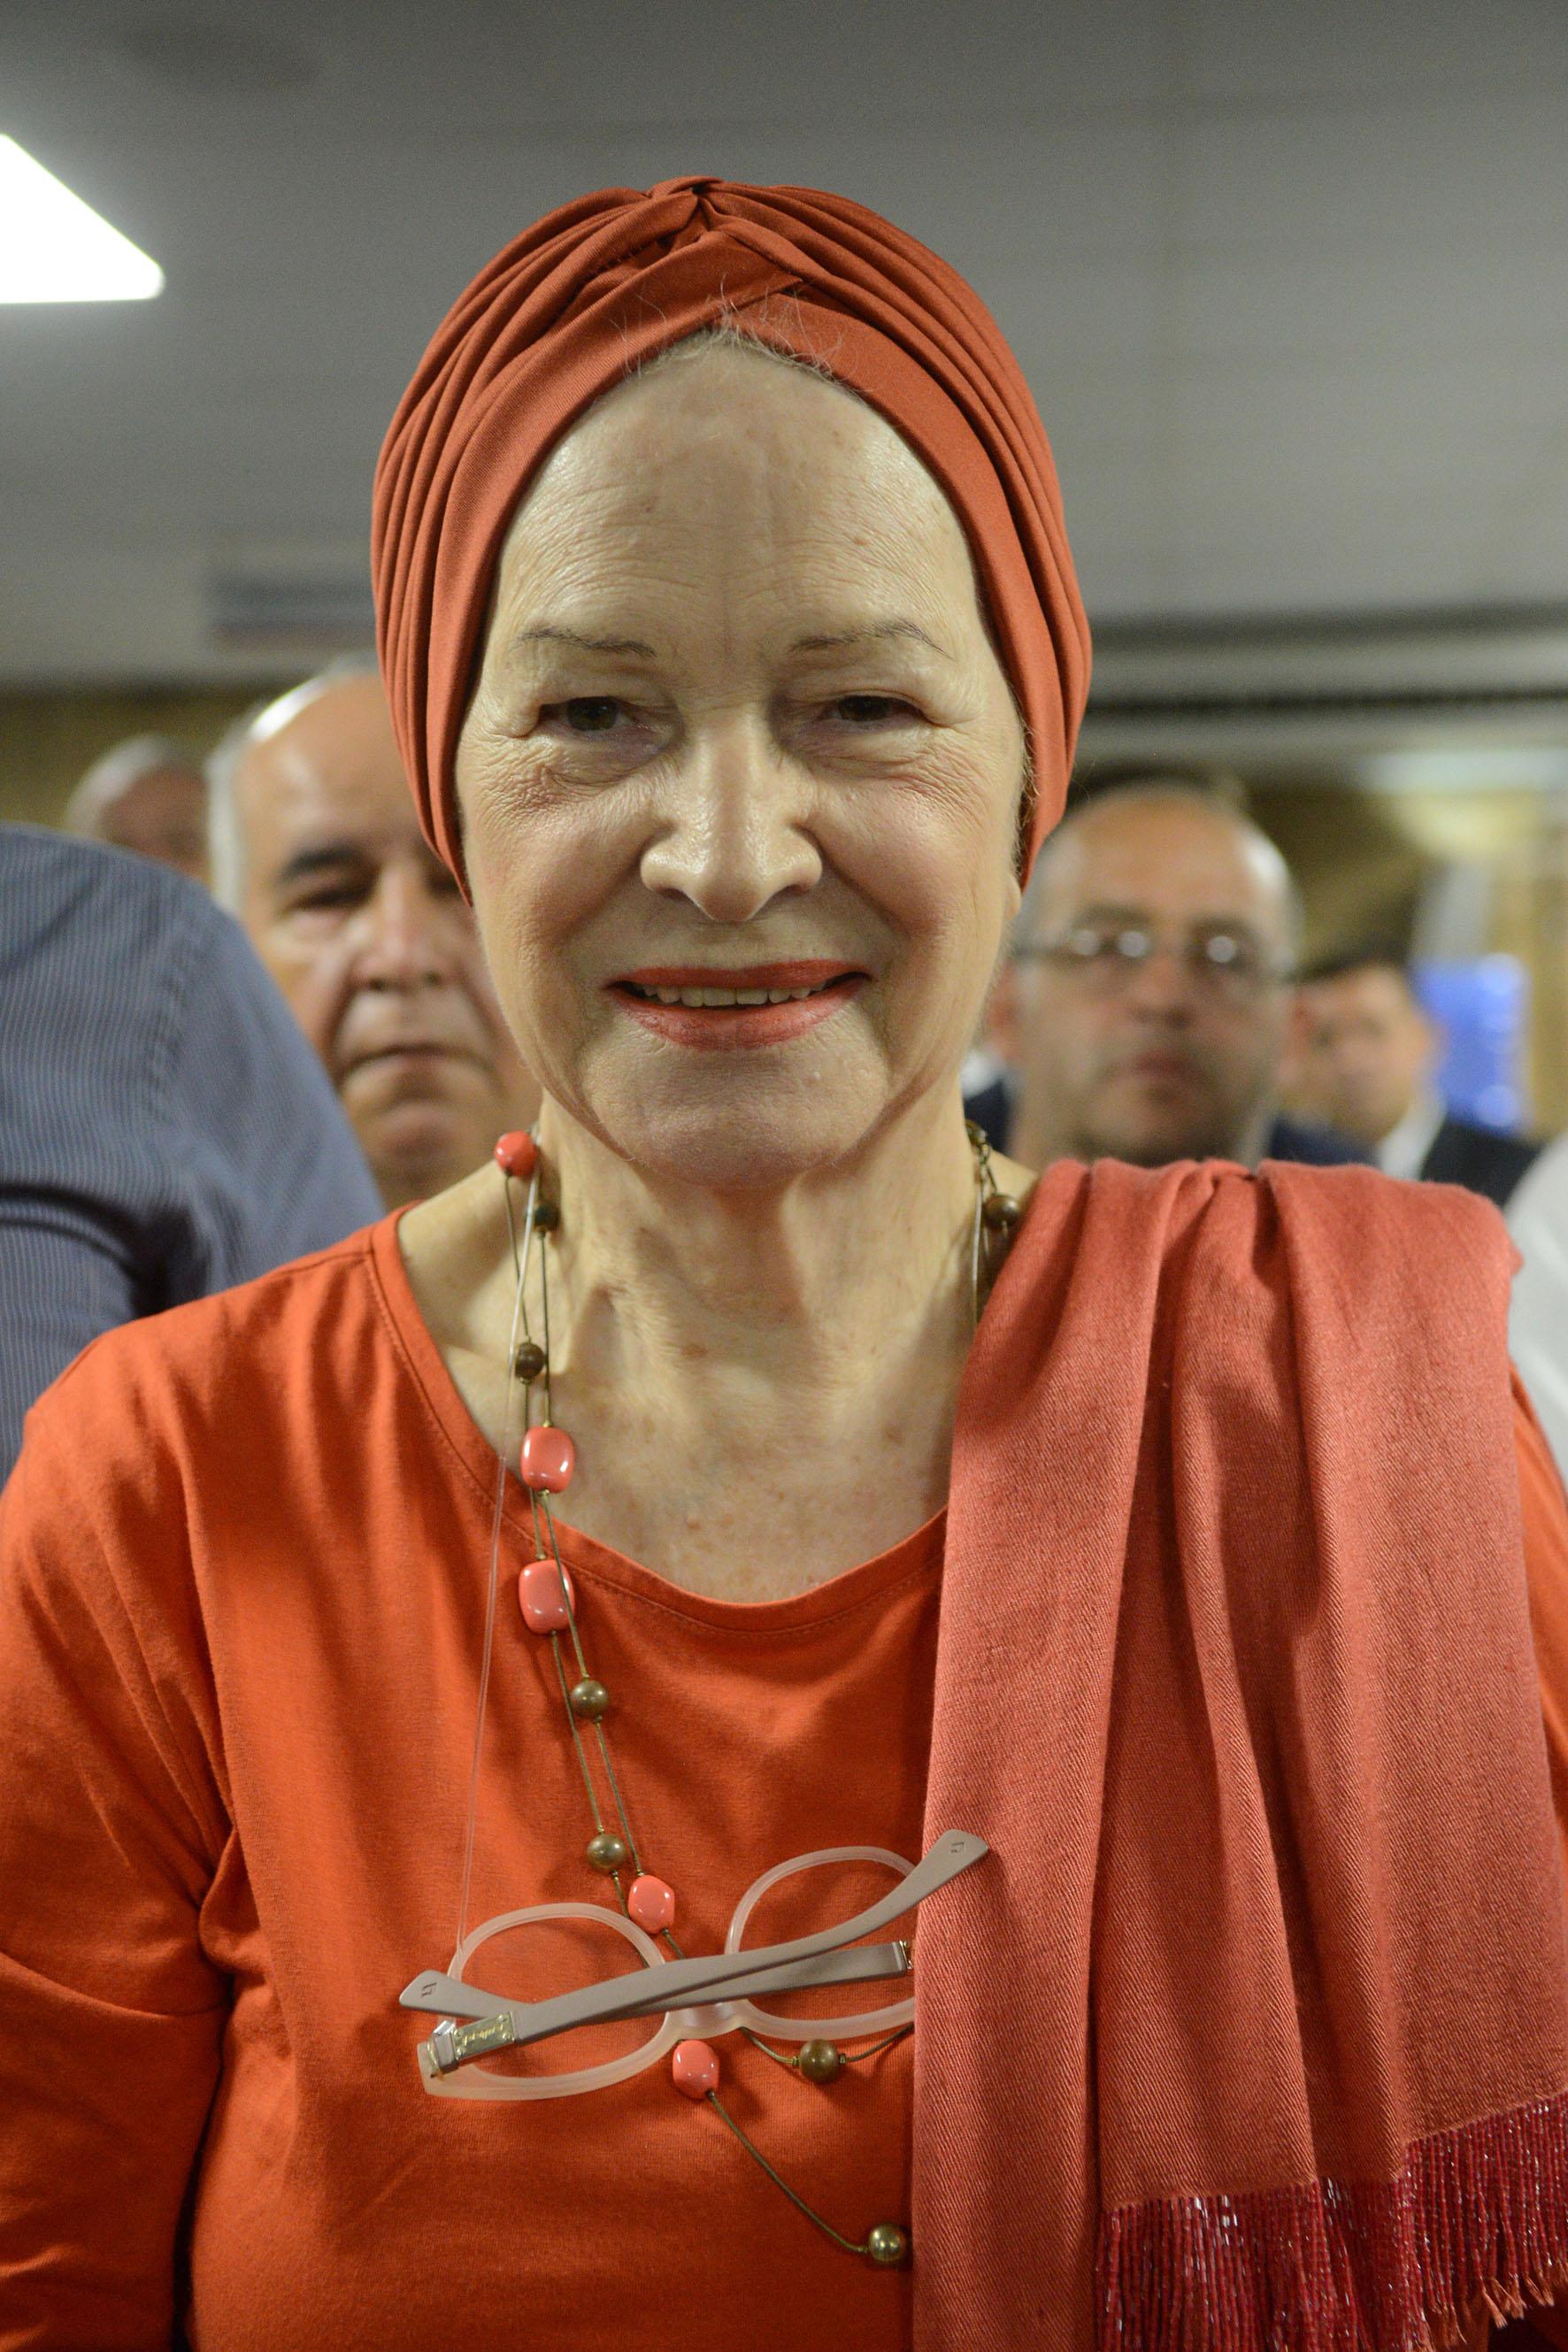 Dalva Christofoletti